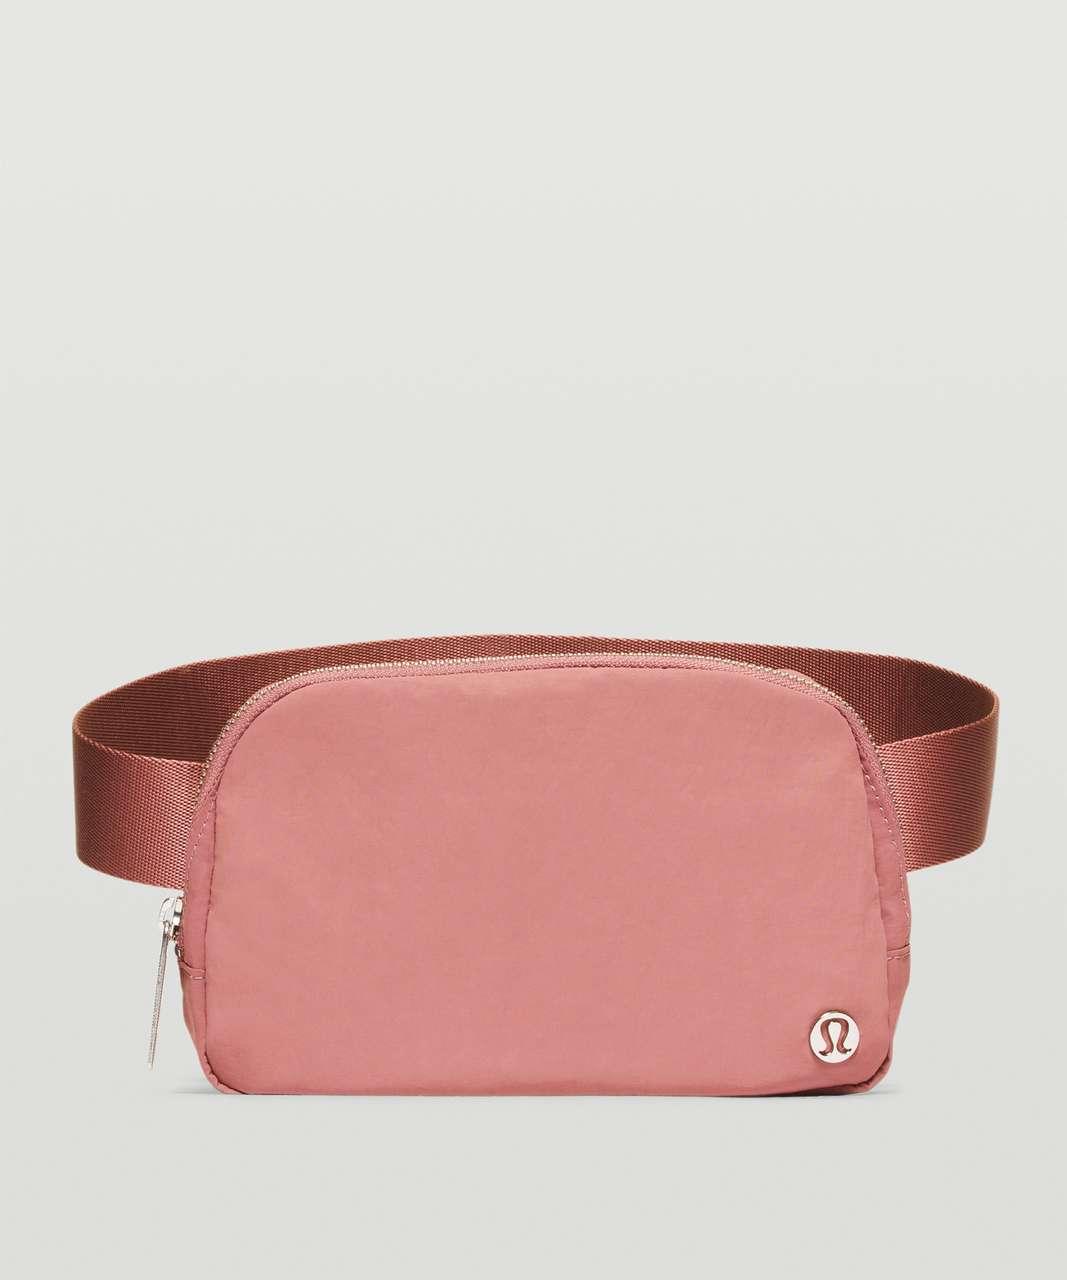 Lululemon Everywhere Belt Bag *1L - Spiced Chai